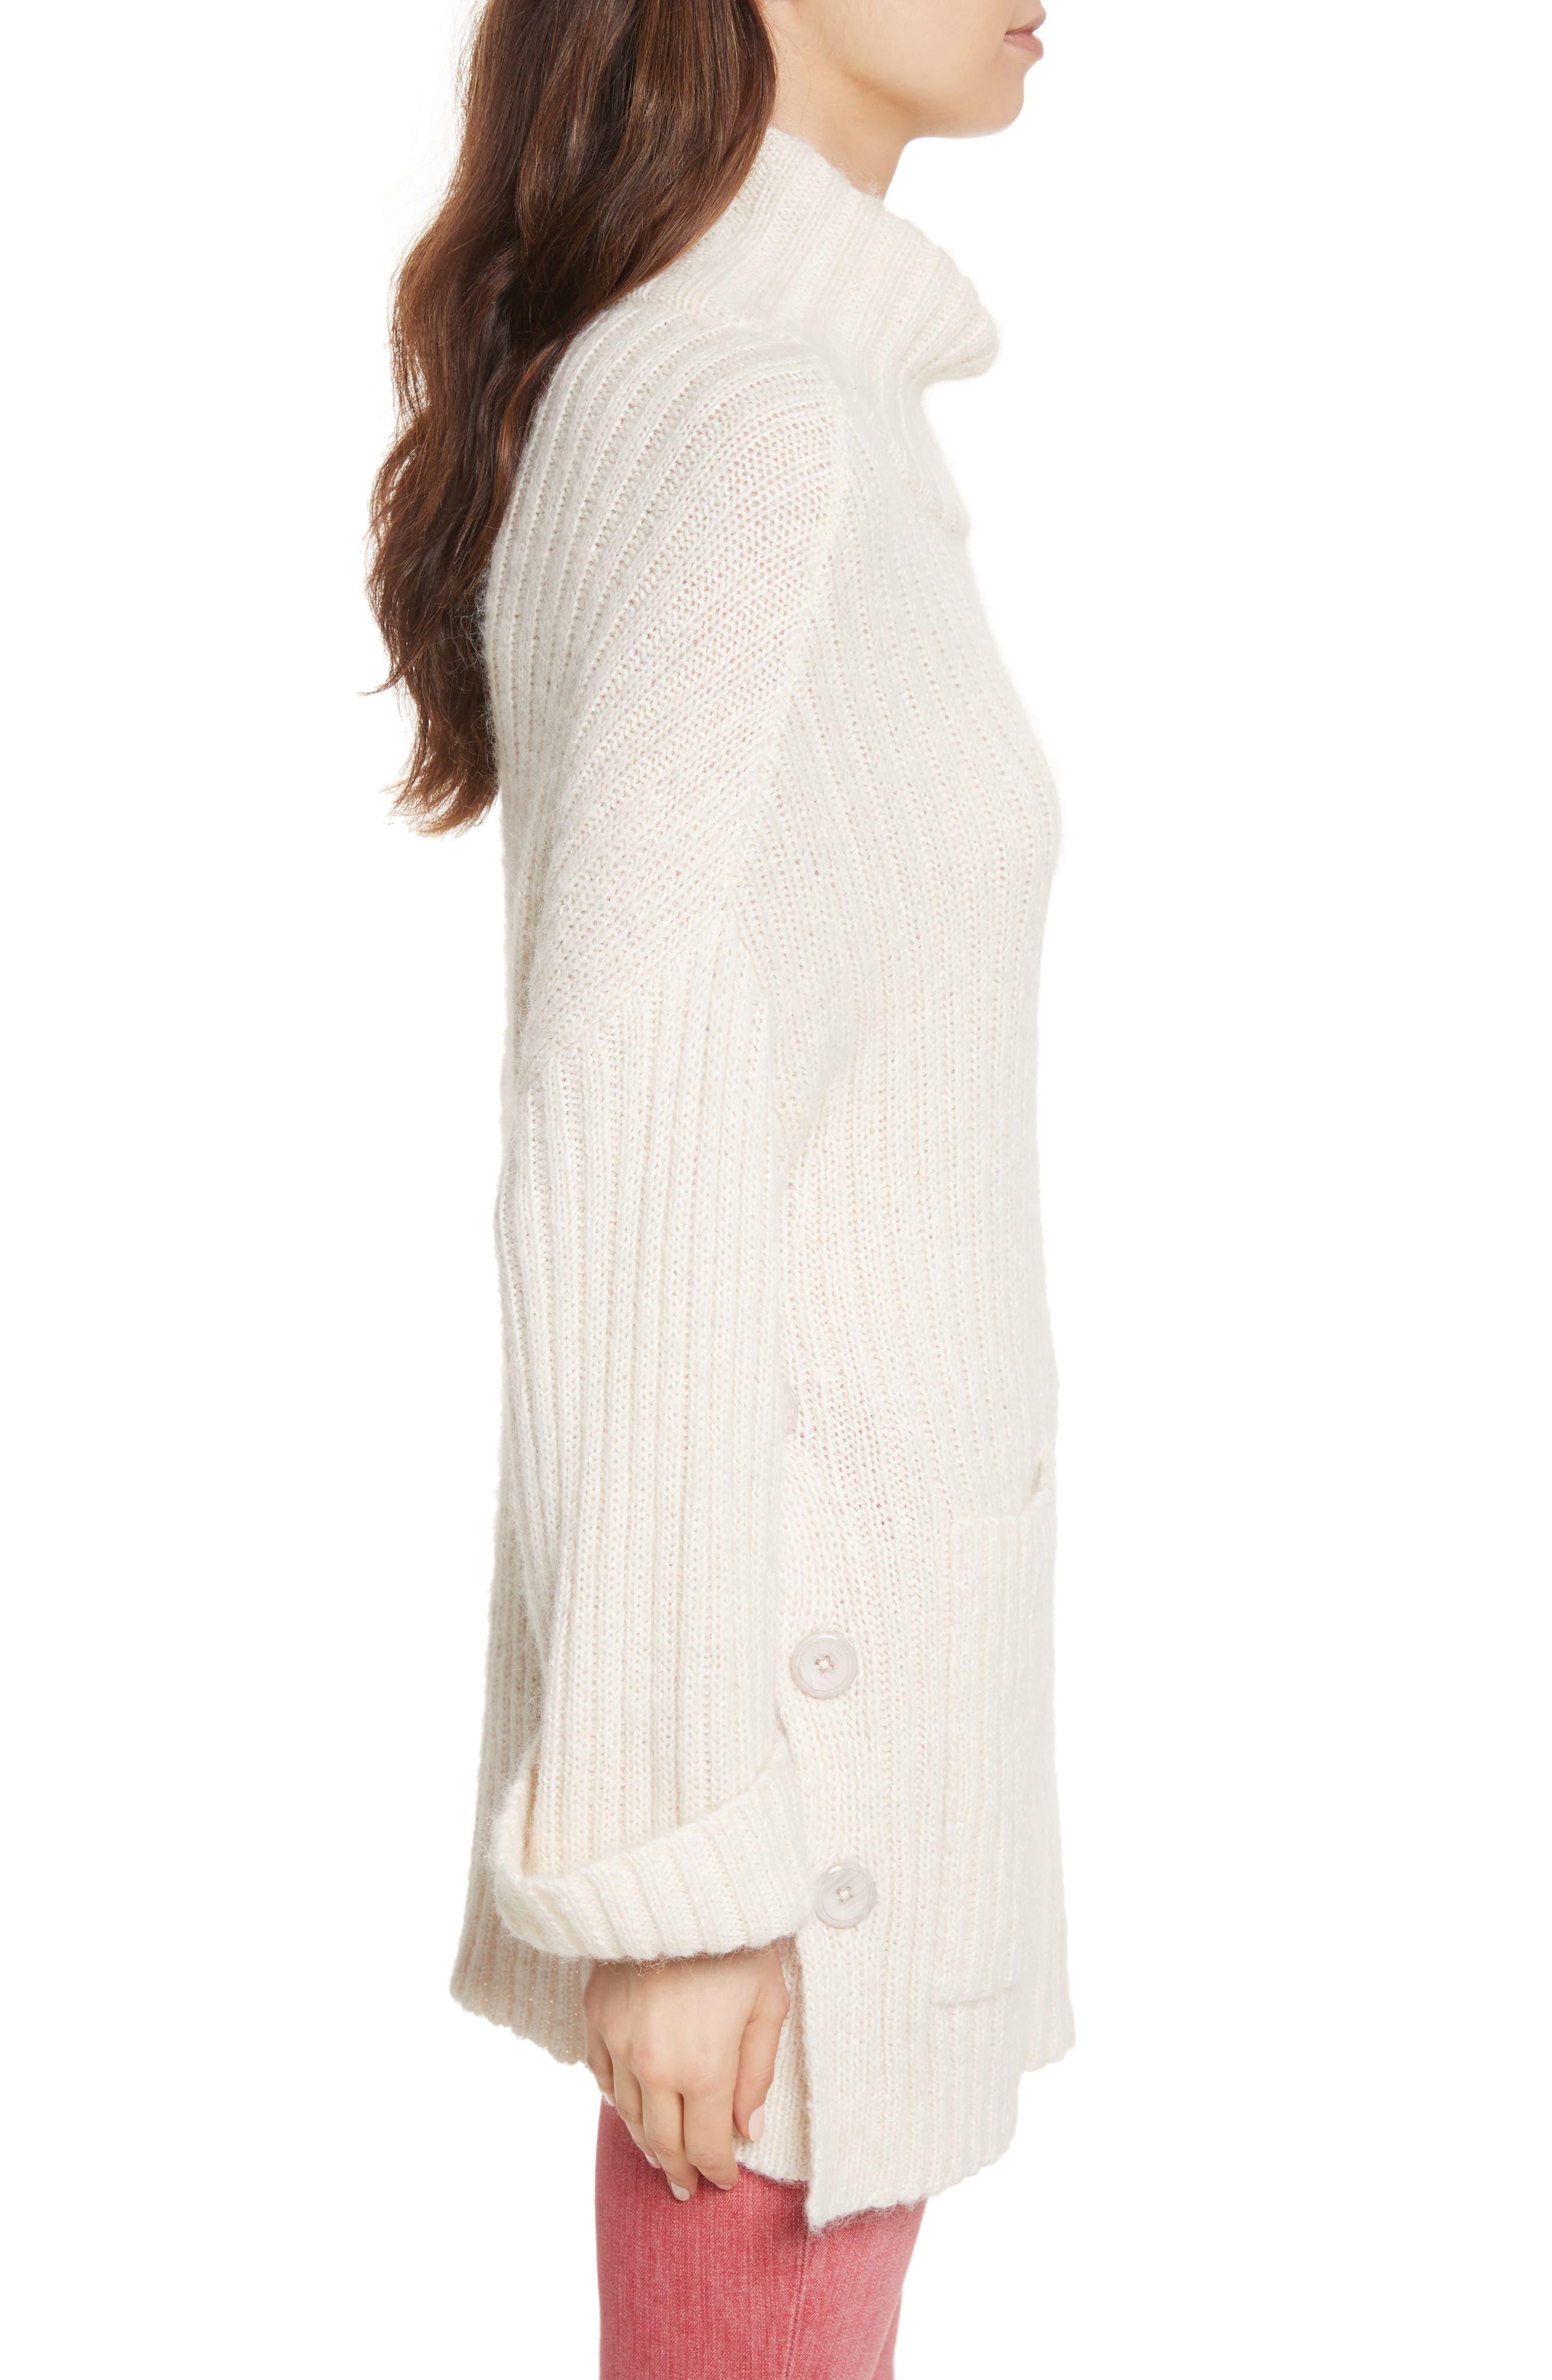 Banain Turtleneck Sweater,                             Alternate thumbnail 3, color,                             114